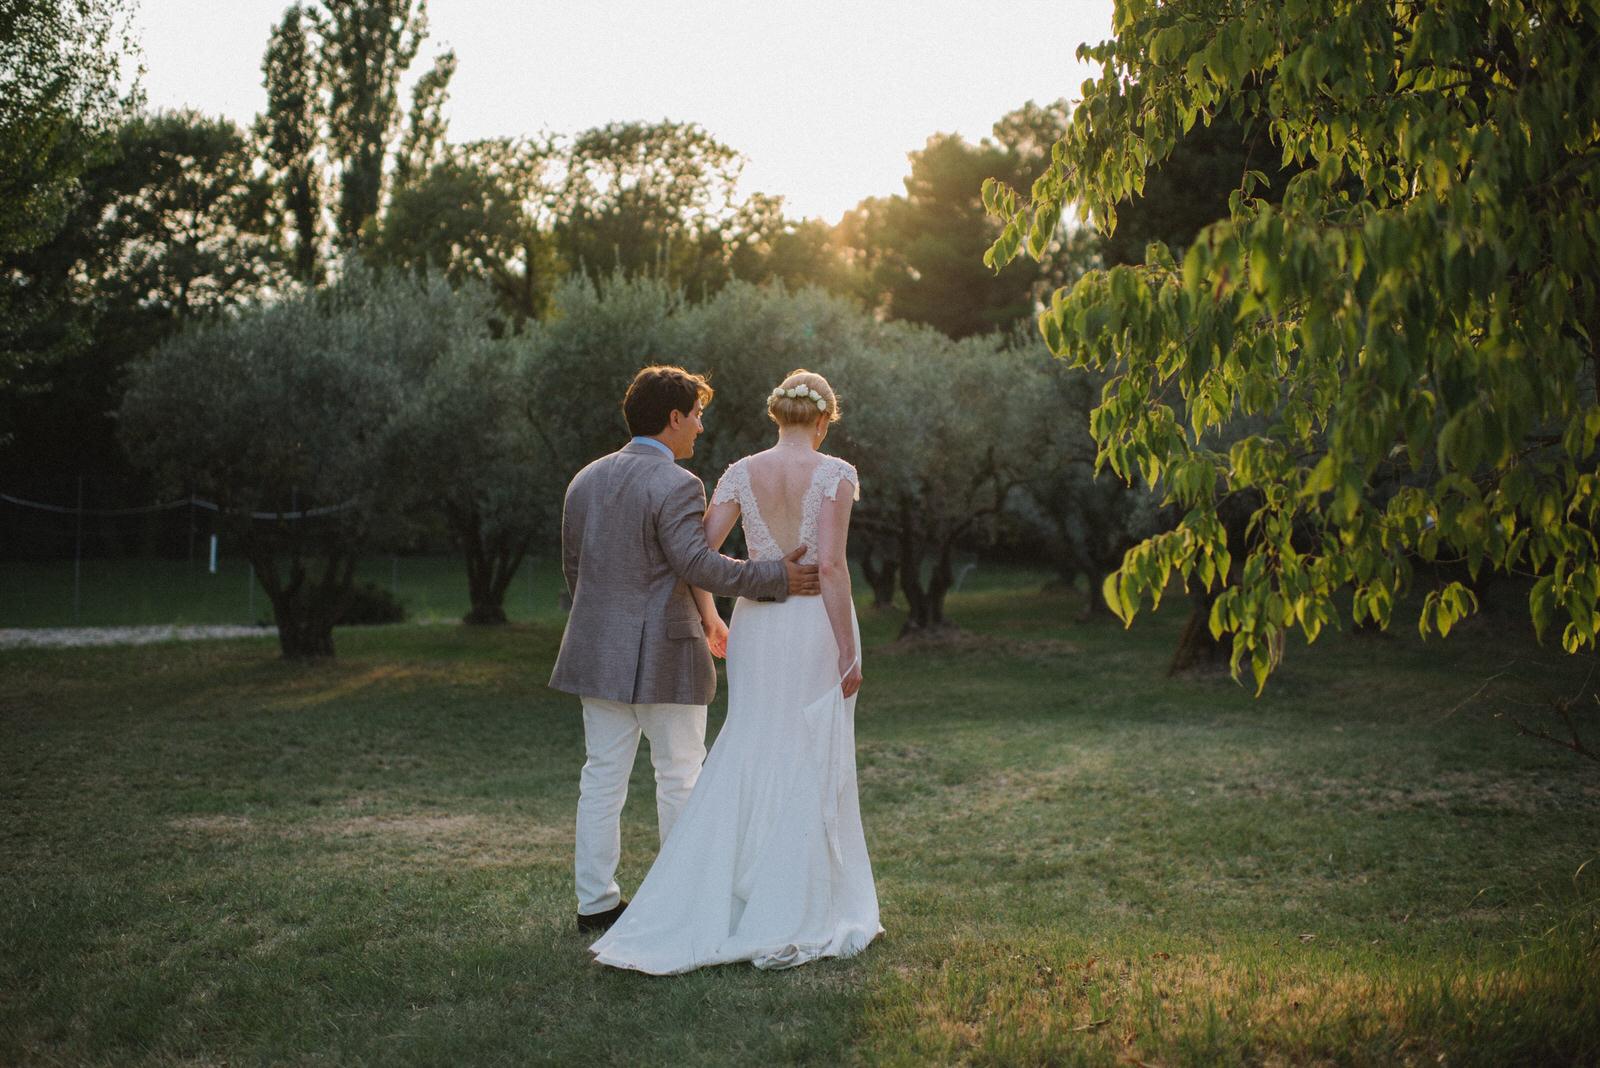 029-LOURMARIN-WEDDING-PHOTOGRAPHER-PROVENCE-WEDDING-ALTERNATIVE-WEDDING-PHOTOGRAPHY-FRANCE-PROVENCE-GARDEN-WEDDING.JPG